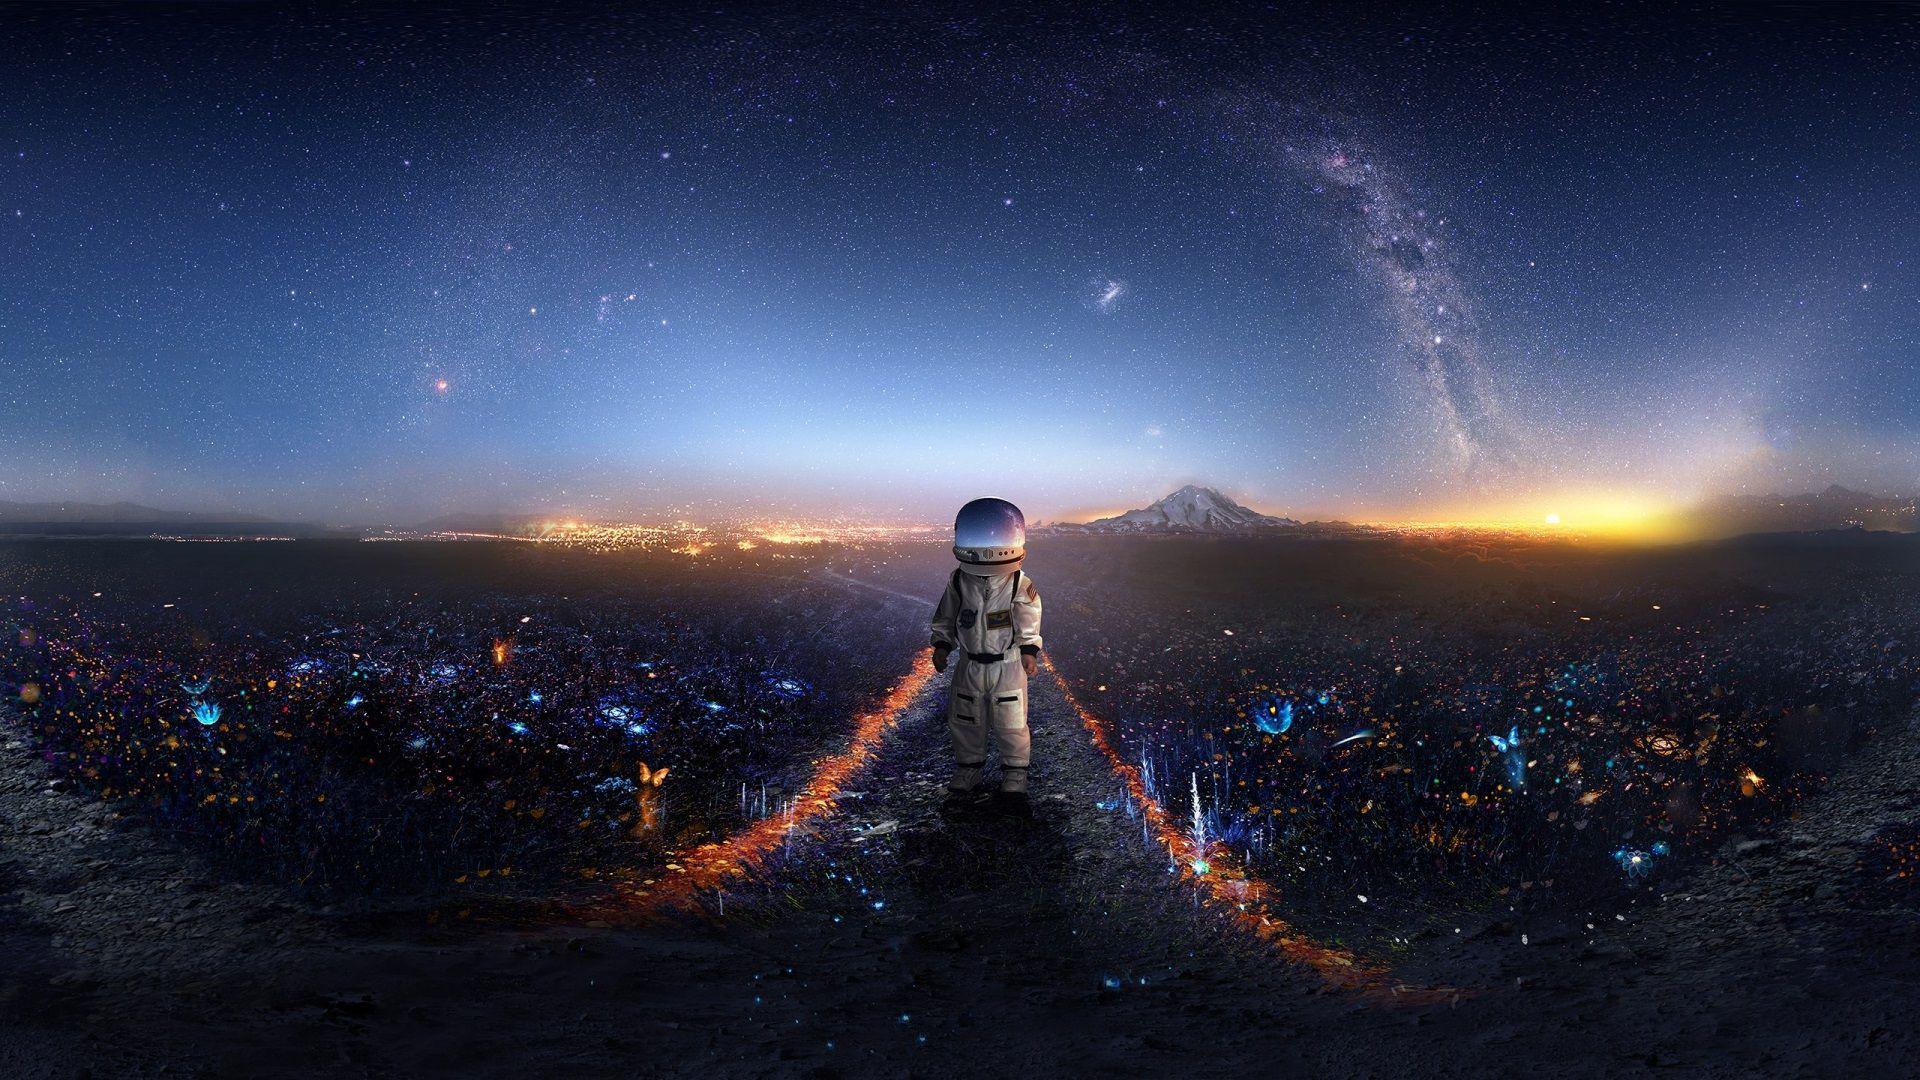 1920x1080 astronaut amazing wallpaper image Astronaut